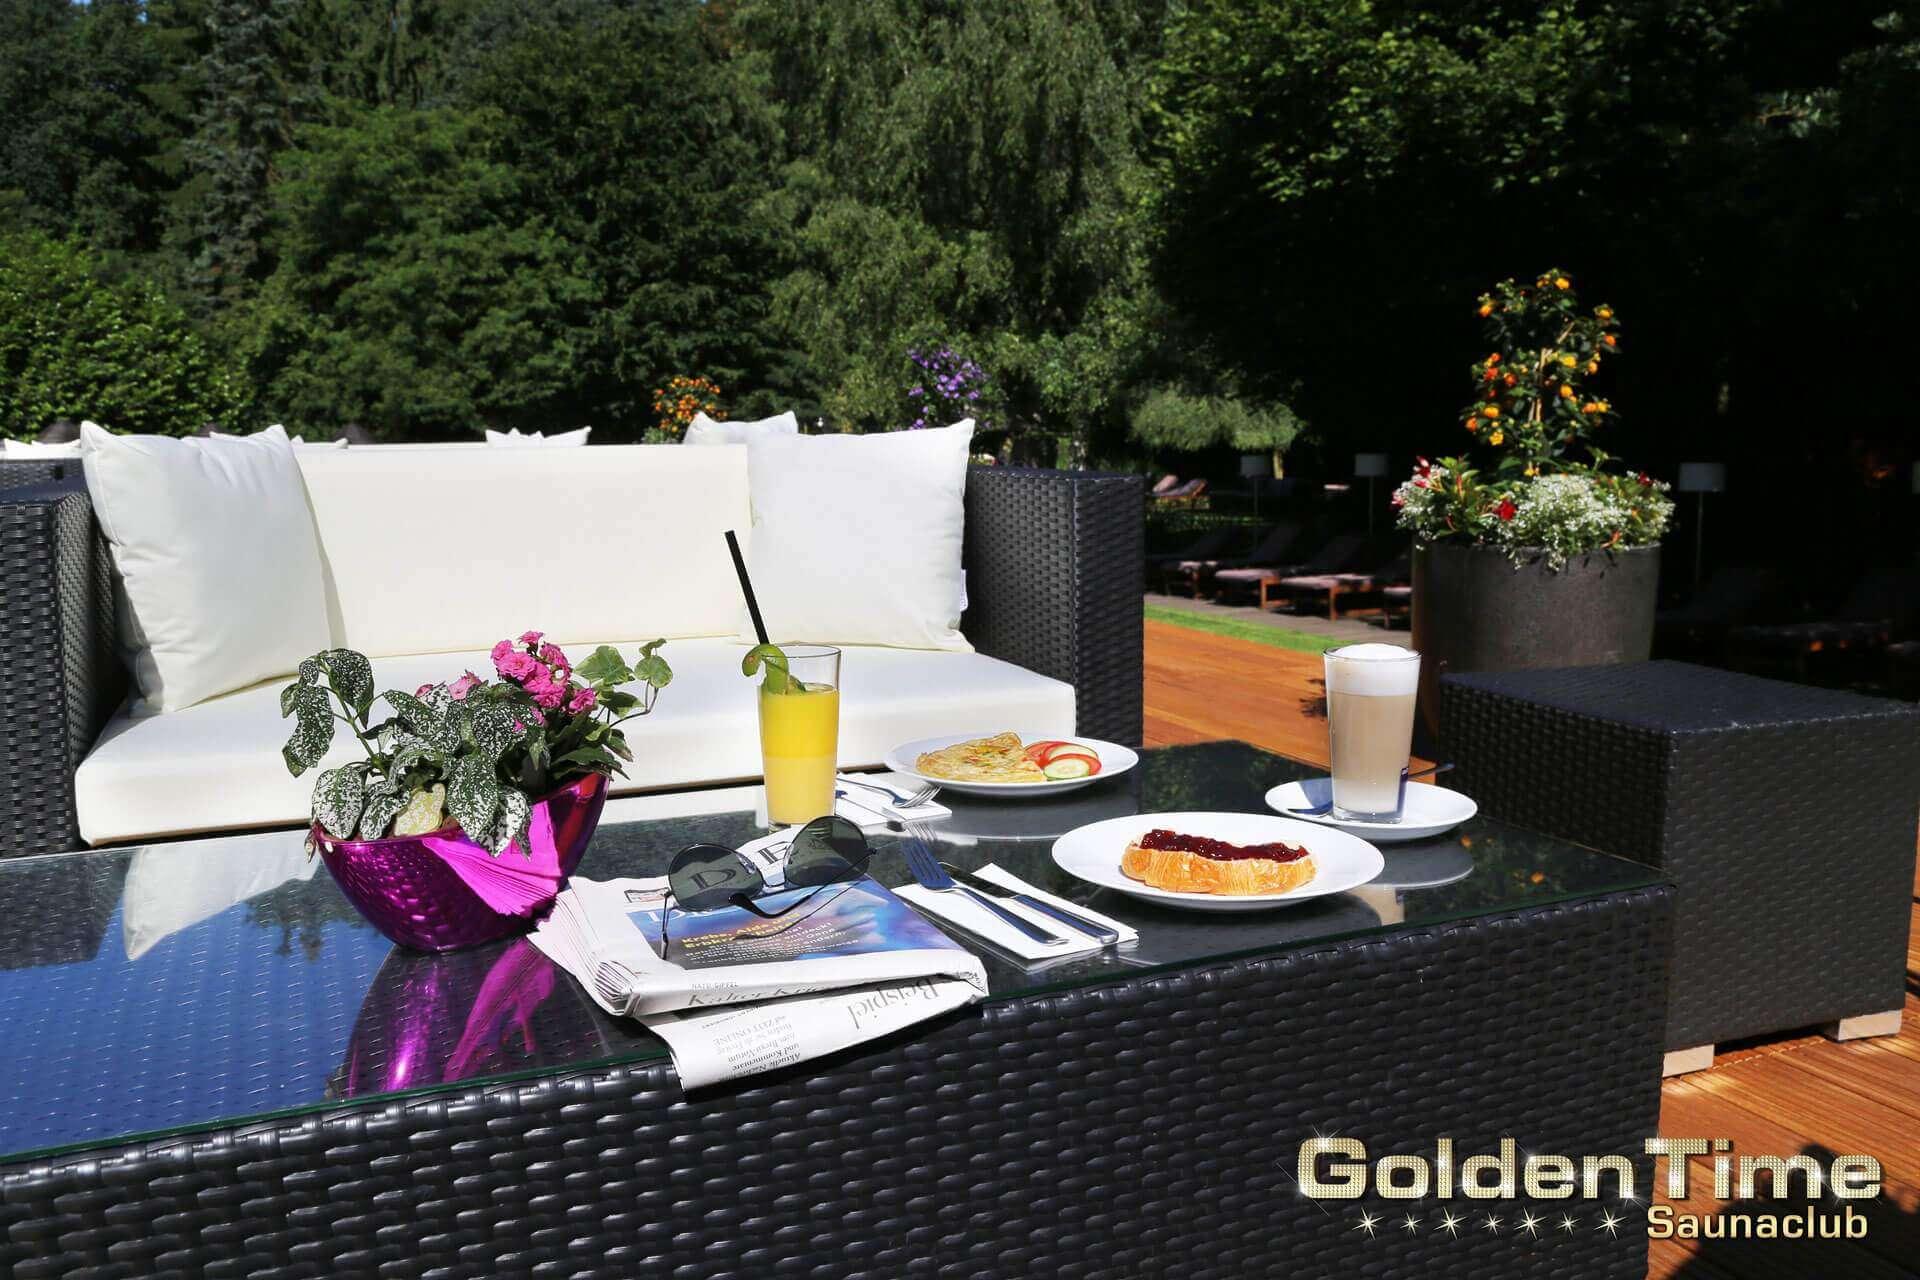 01-terrasse-pic-03-goldentime-saunaclub.jpg